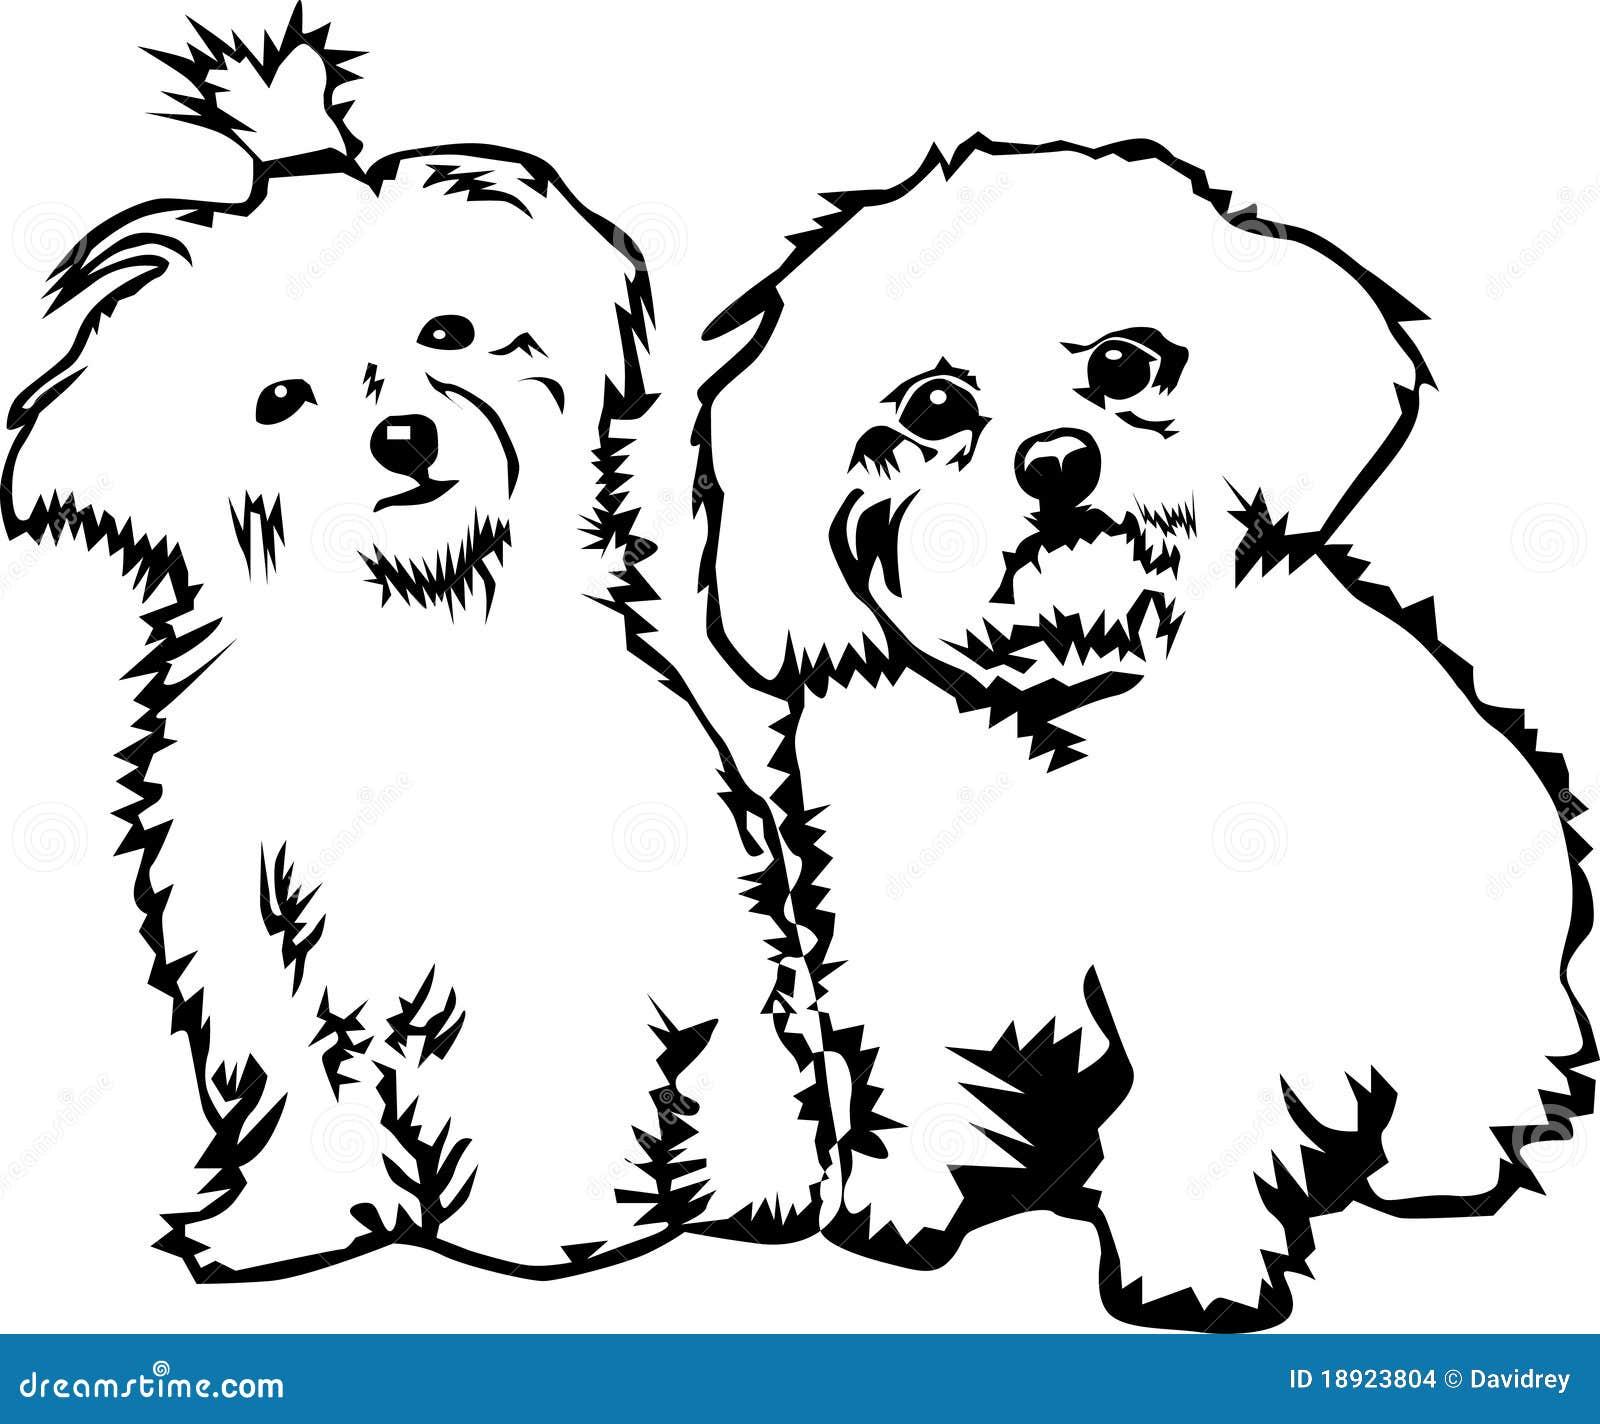 free clipart maltese dog - photo #28